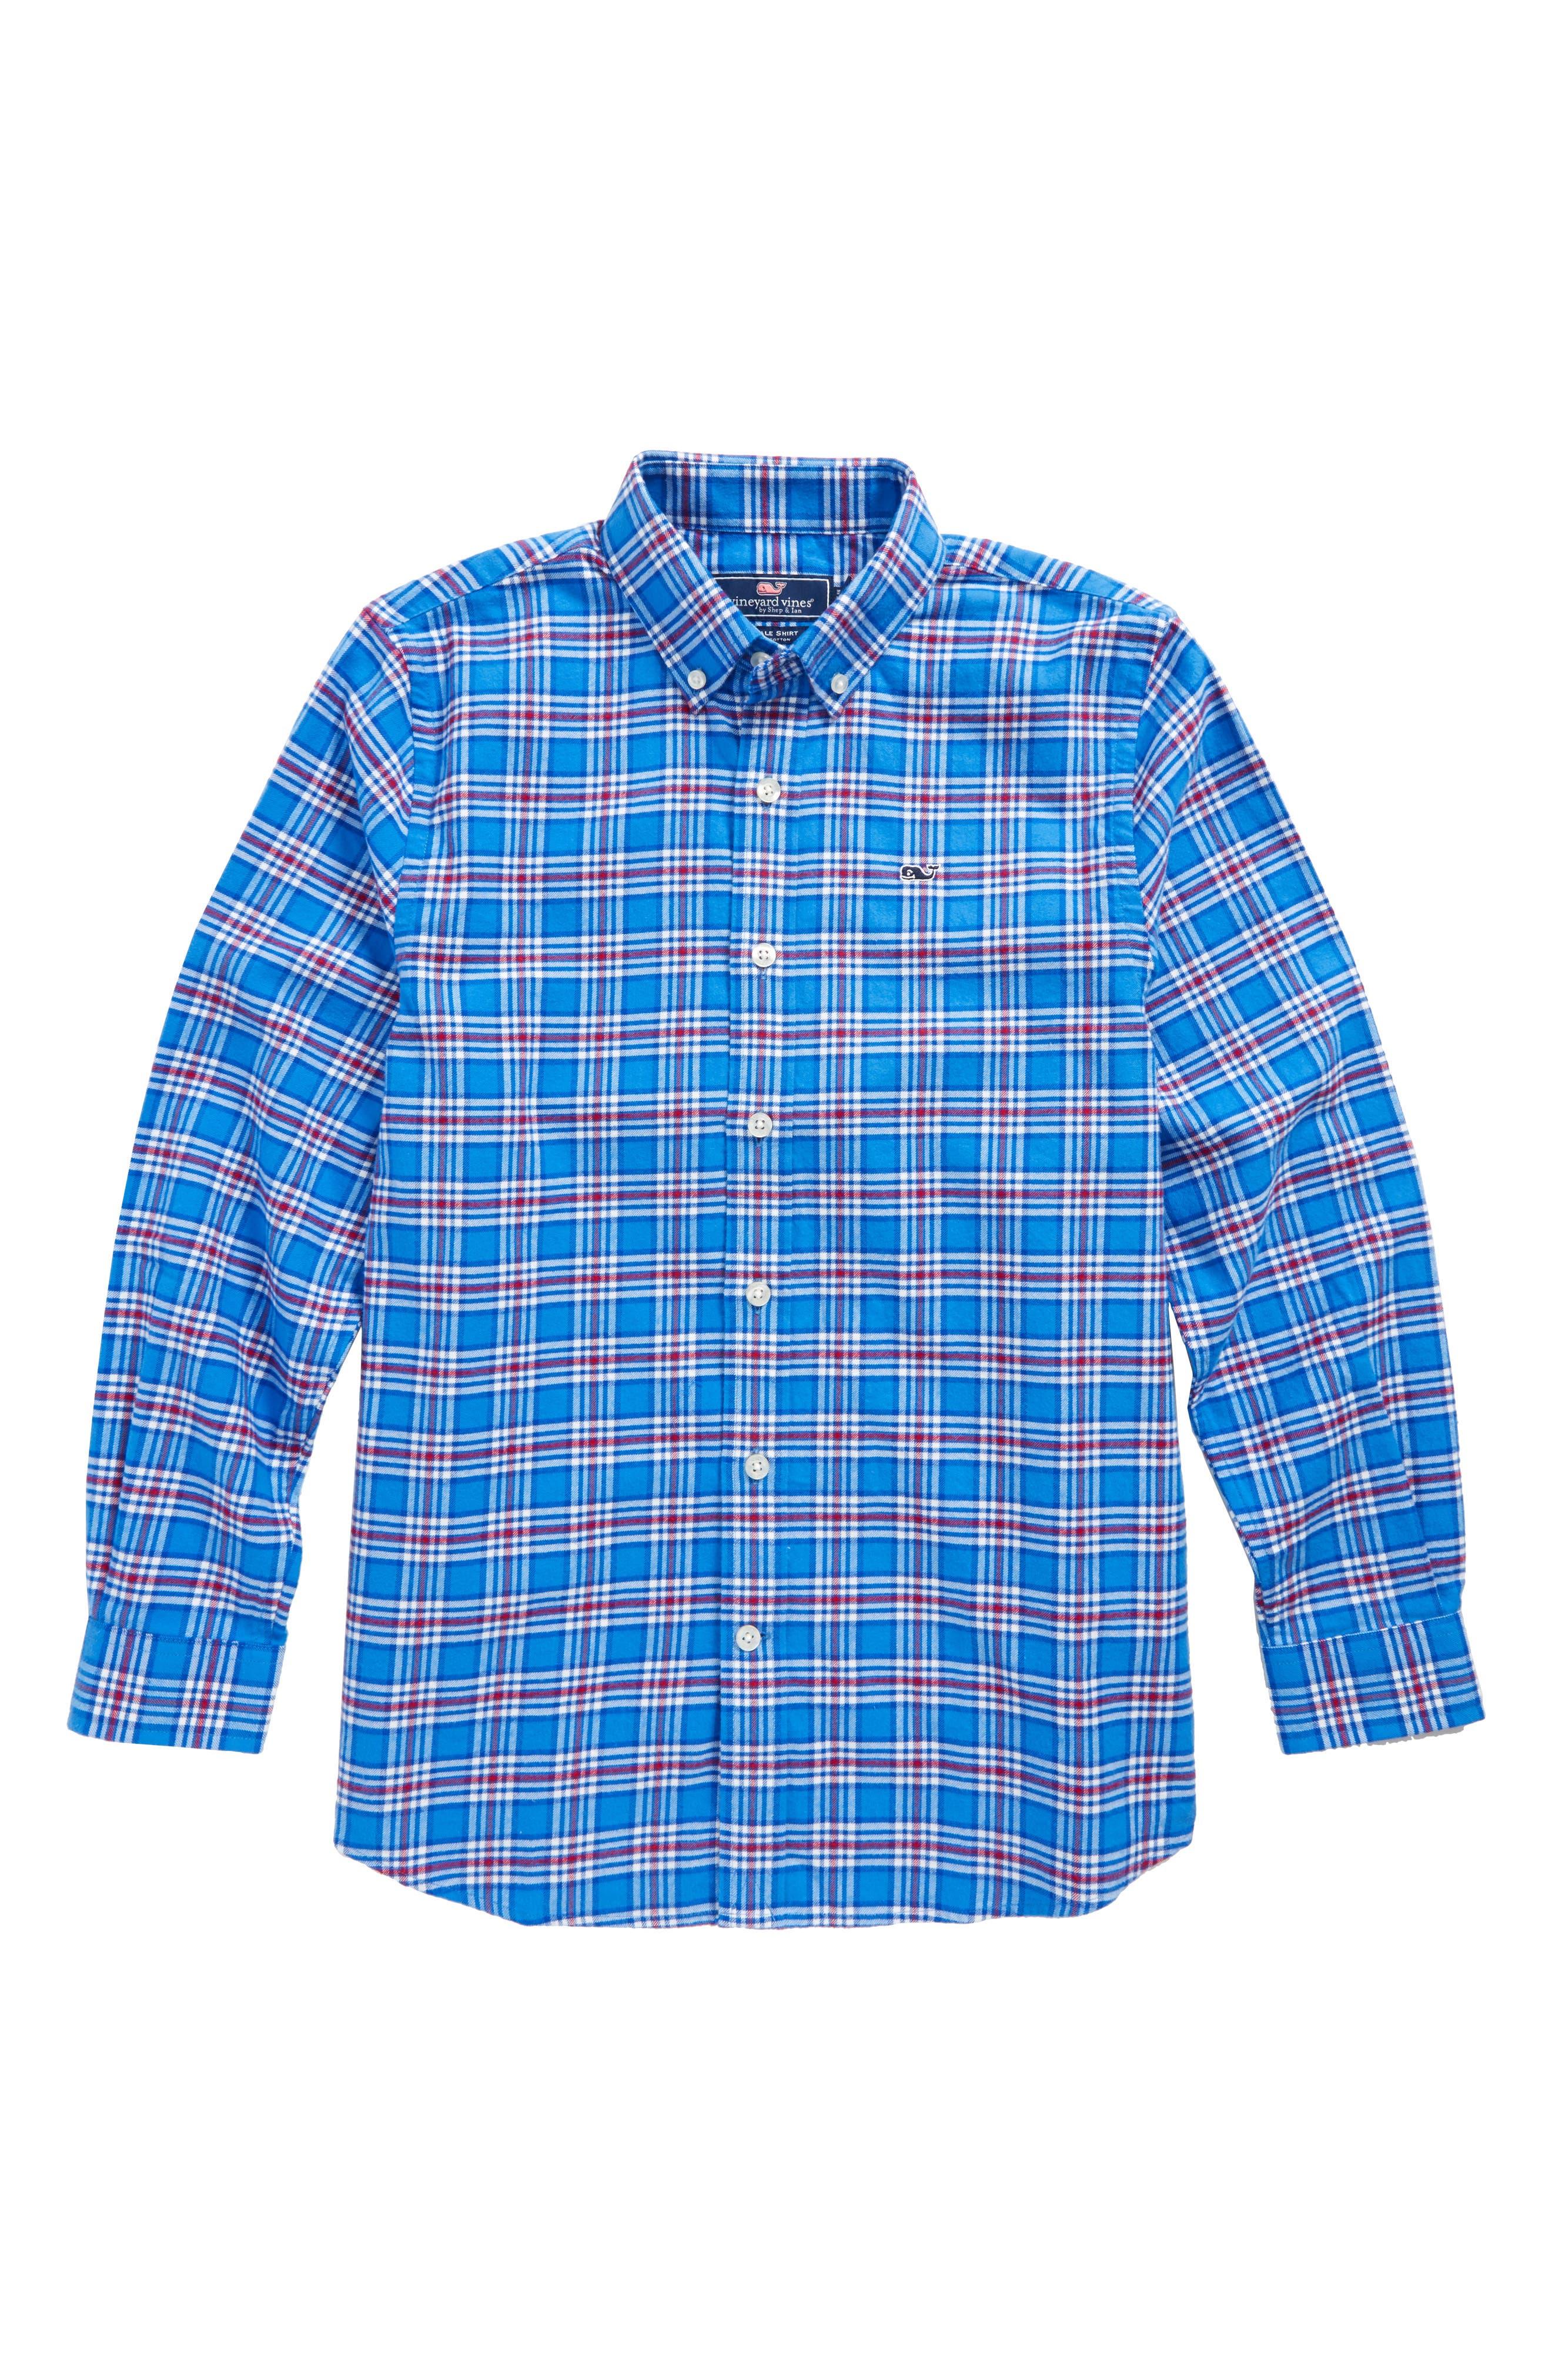 Main Image - vineyard vines Chandler Pond Plaid Flannel Shirt (Big Boys)